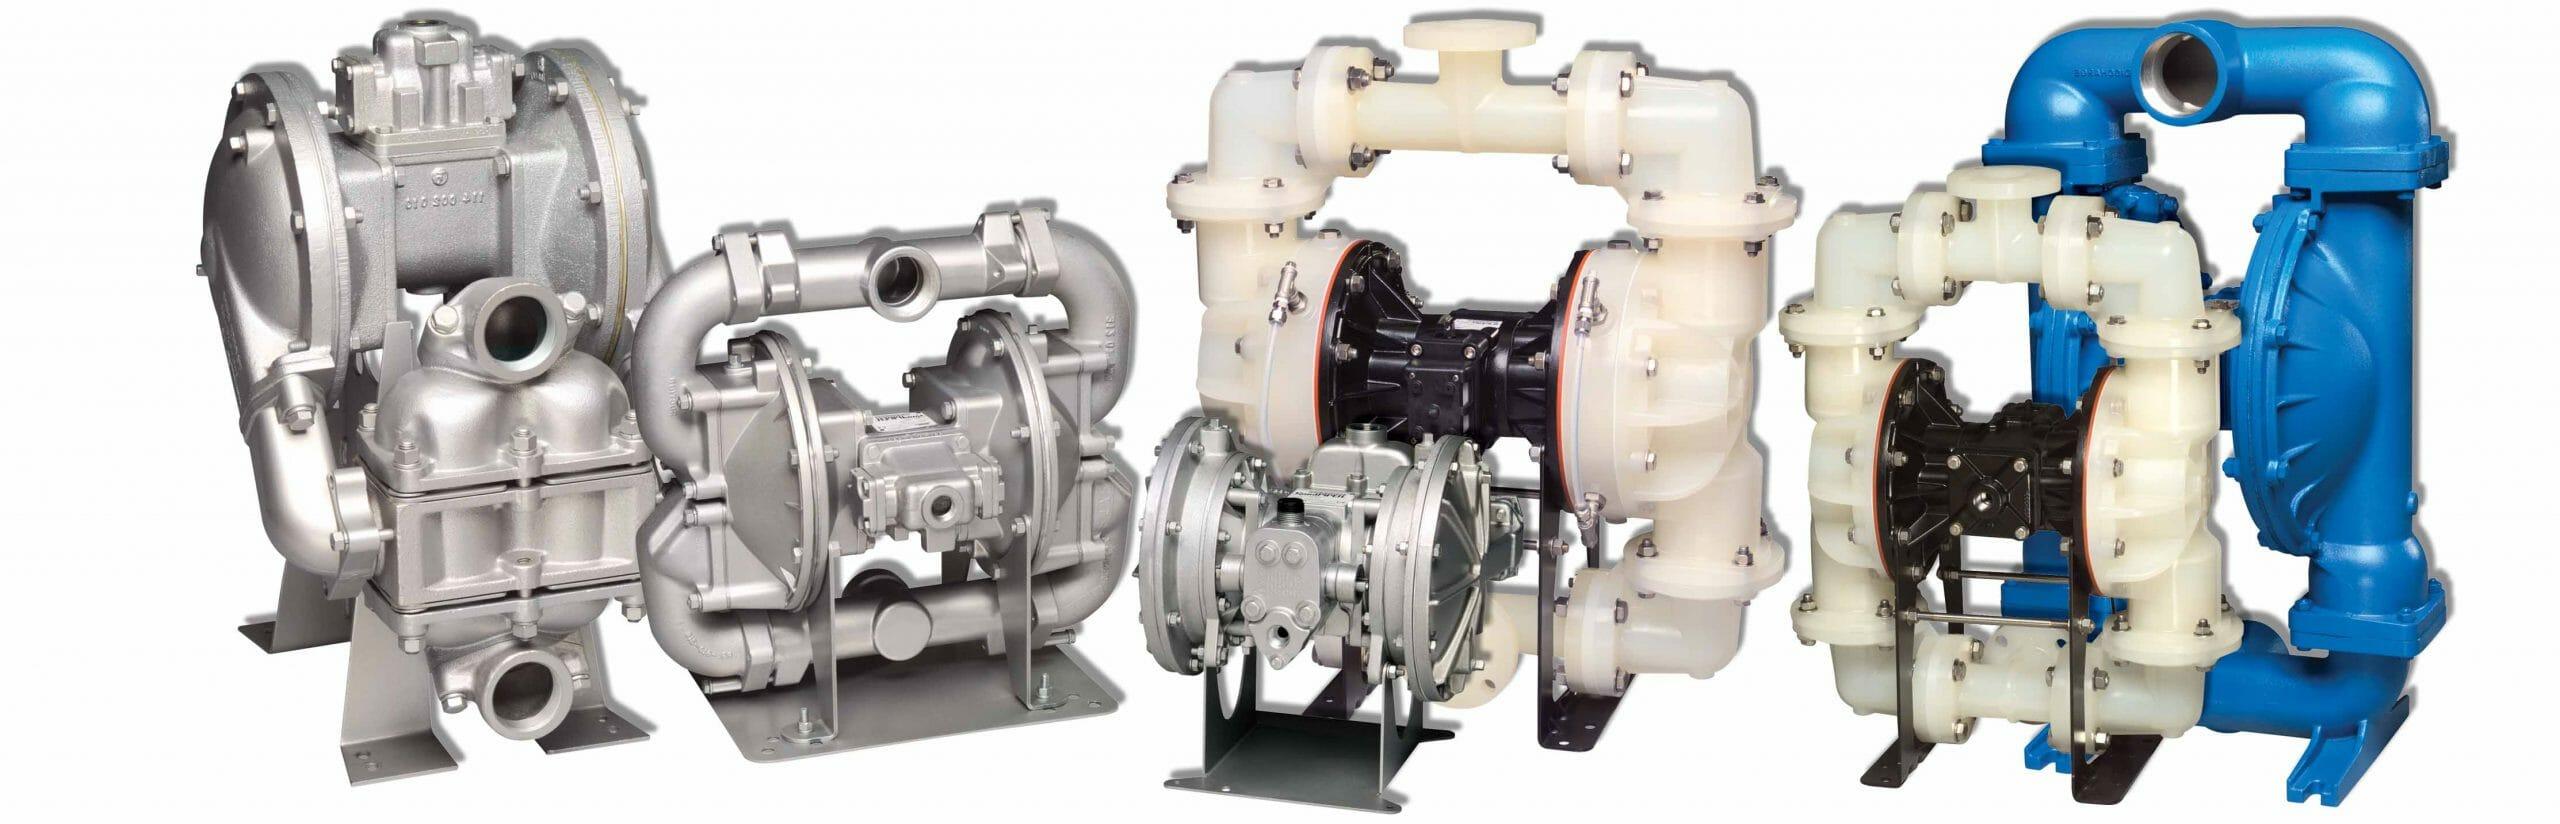 Пневматические насосы sandpiper pumps